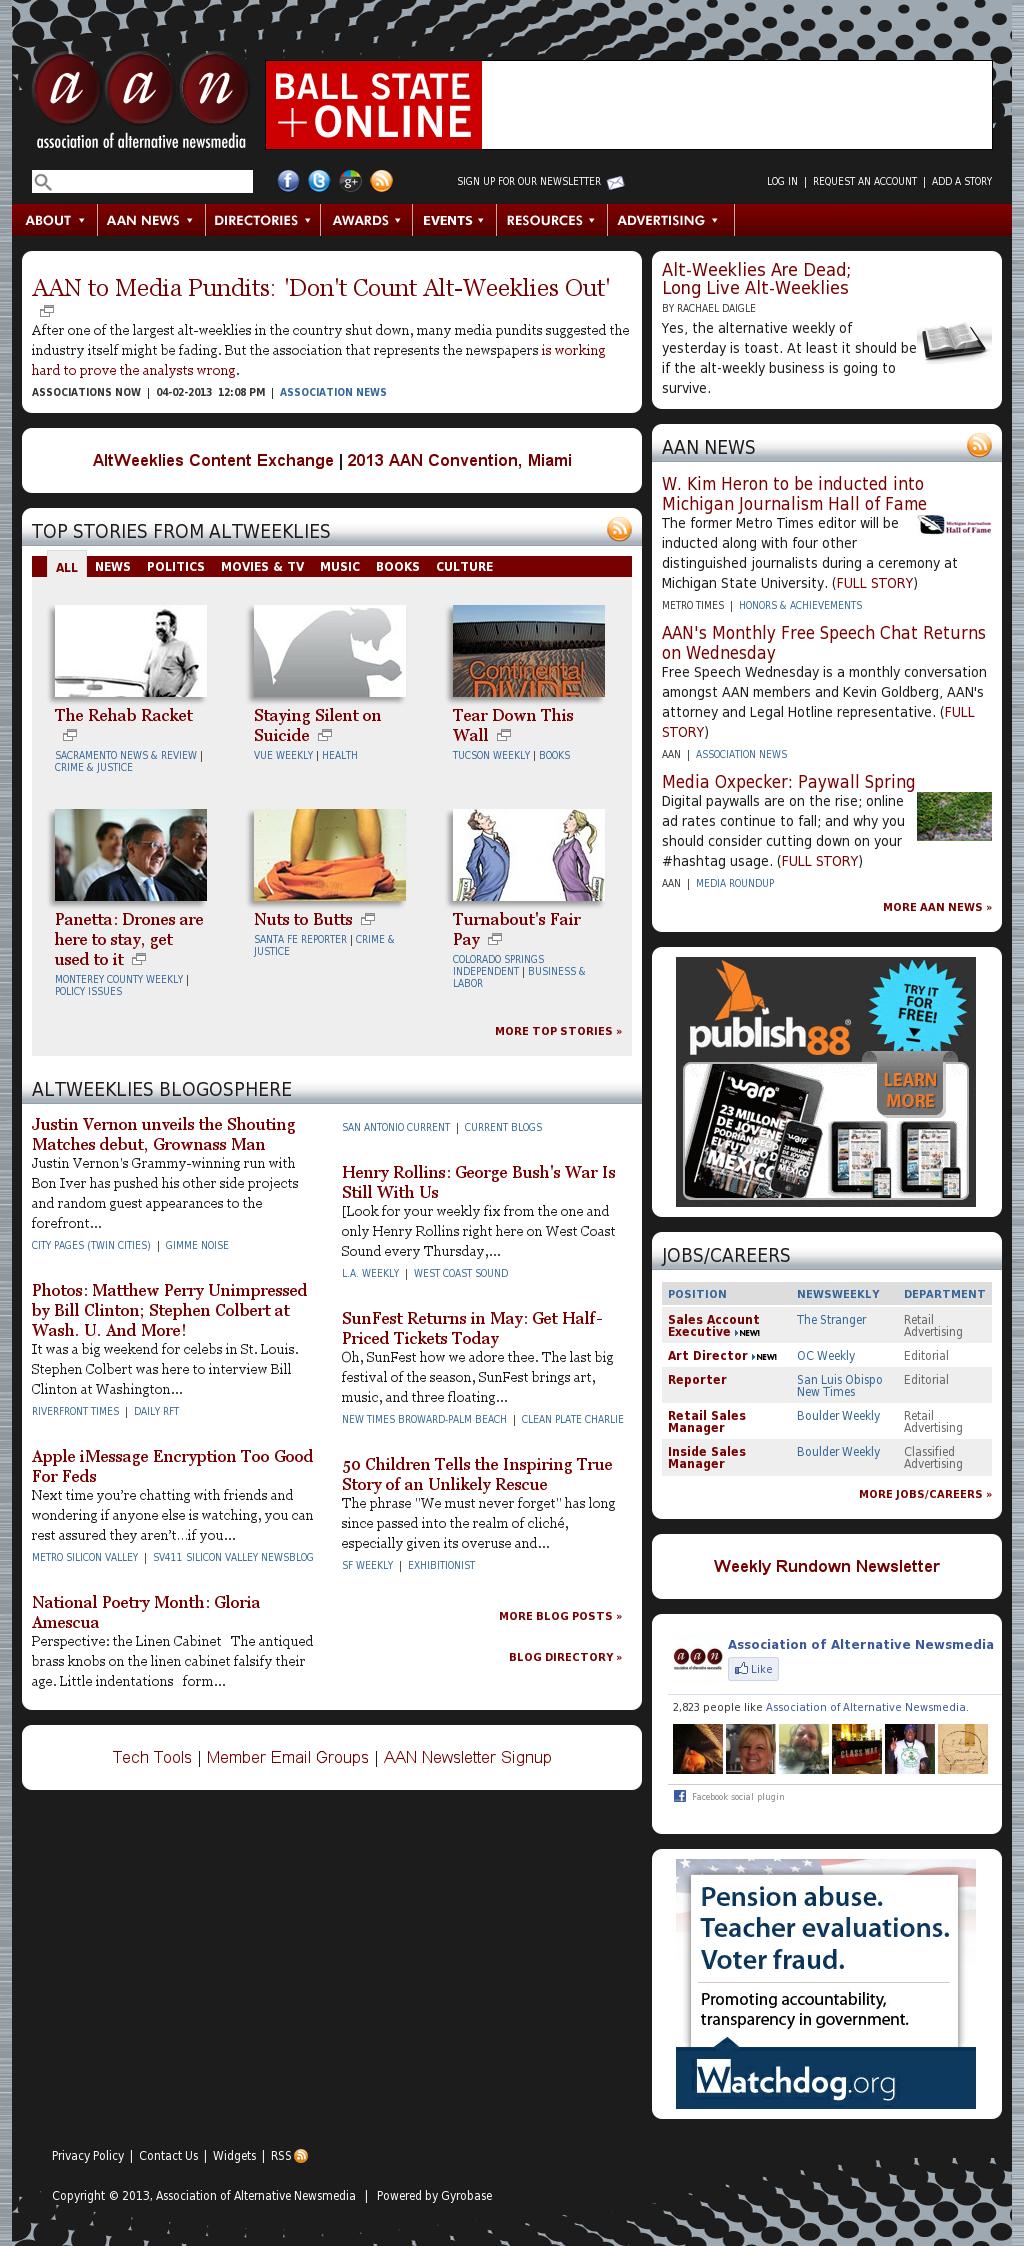 Association of Alternative Newsmedia at Monday April 8, 2013, 9:01 p.m. UTC